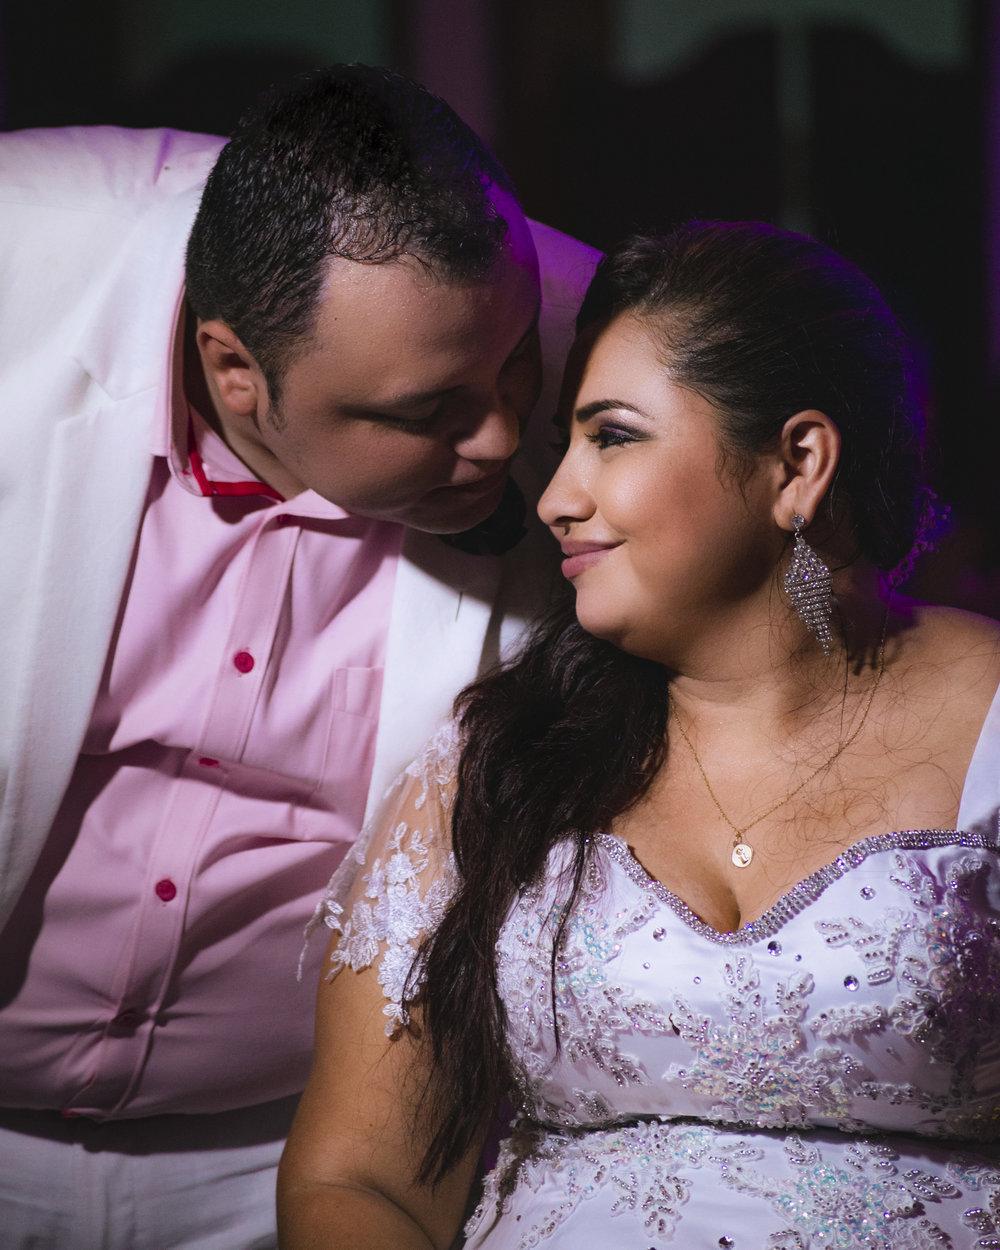 fotografo de boda fotografia de boda bogota preboda boda colombia